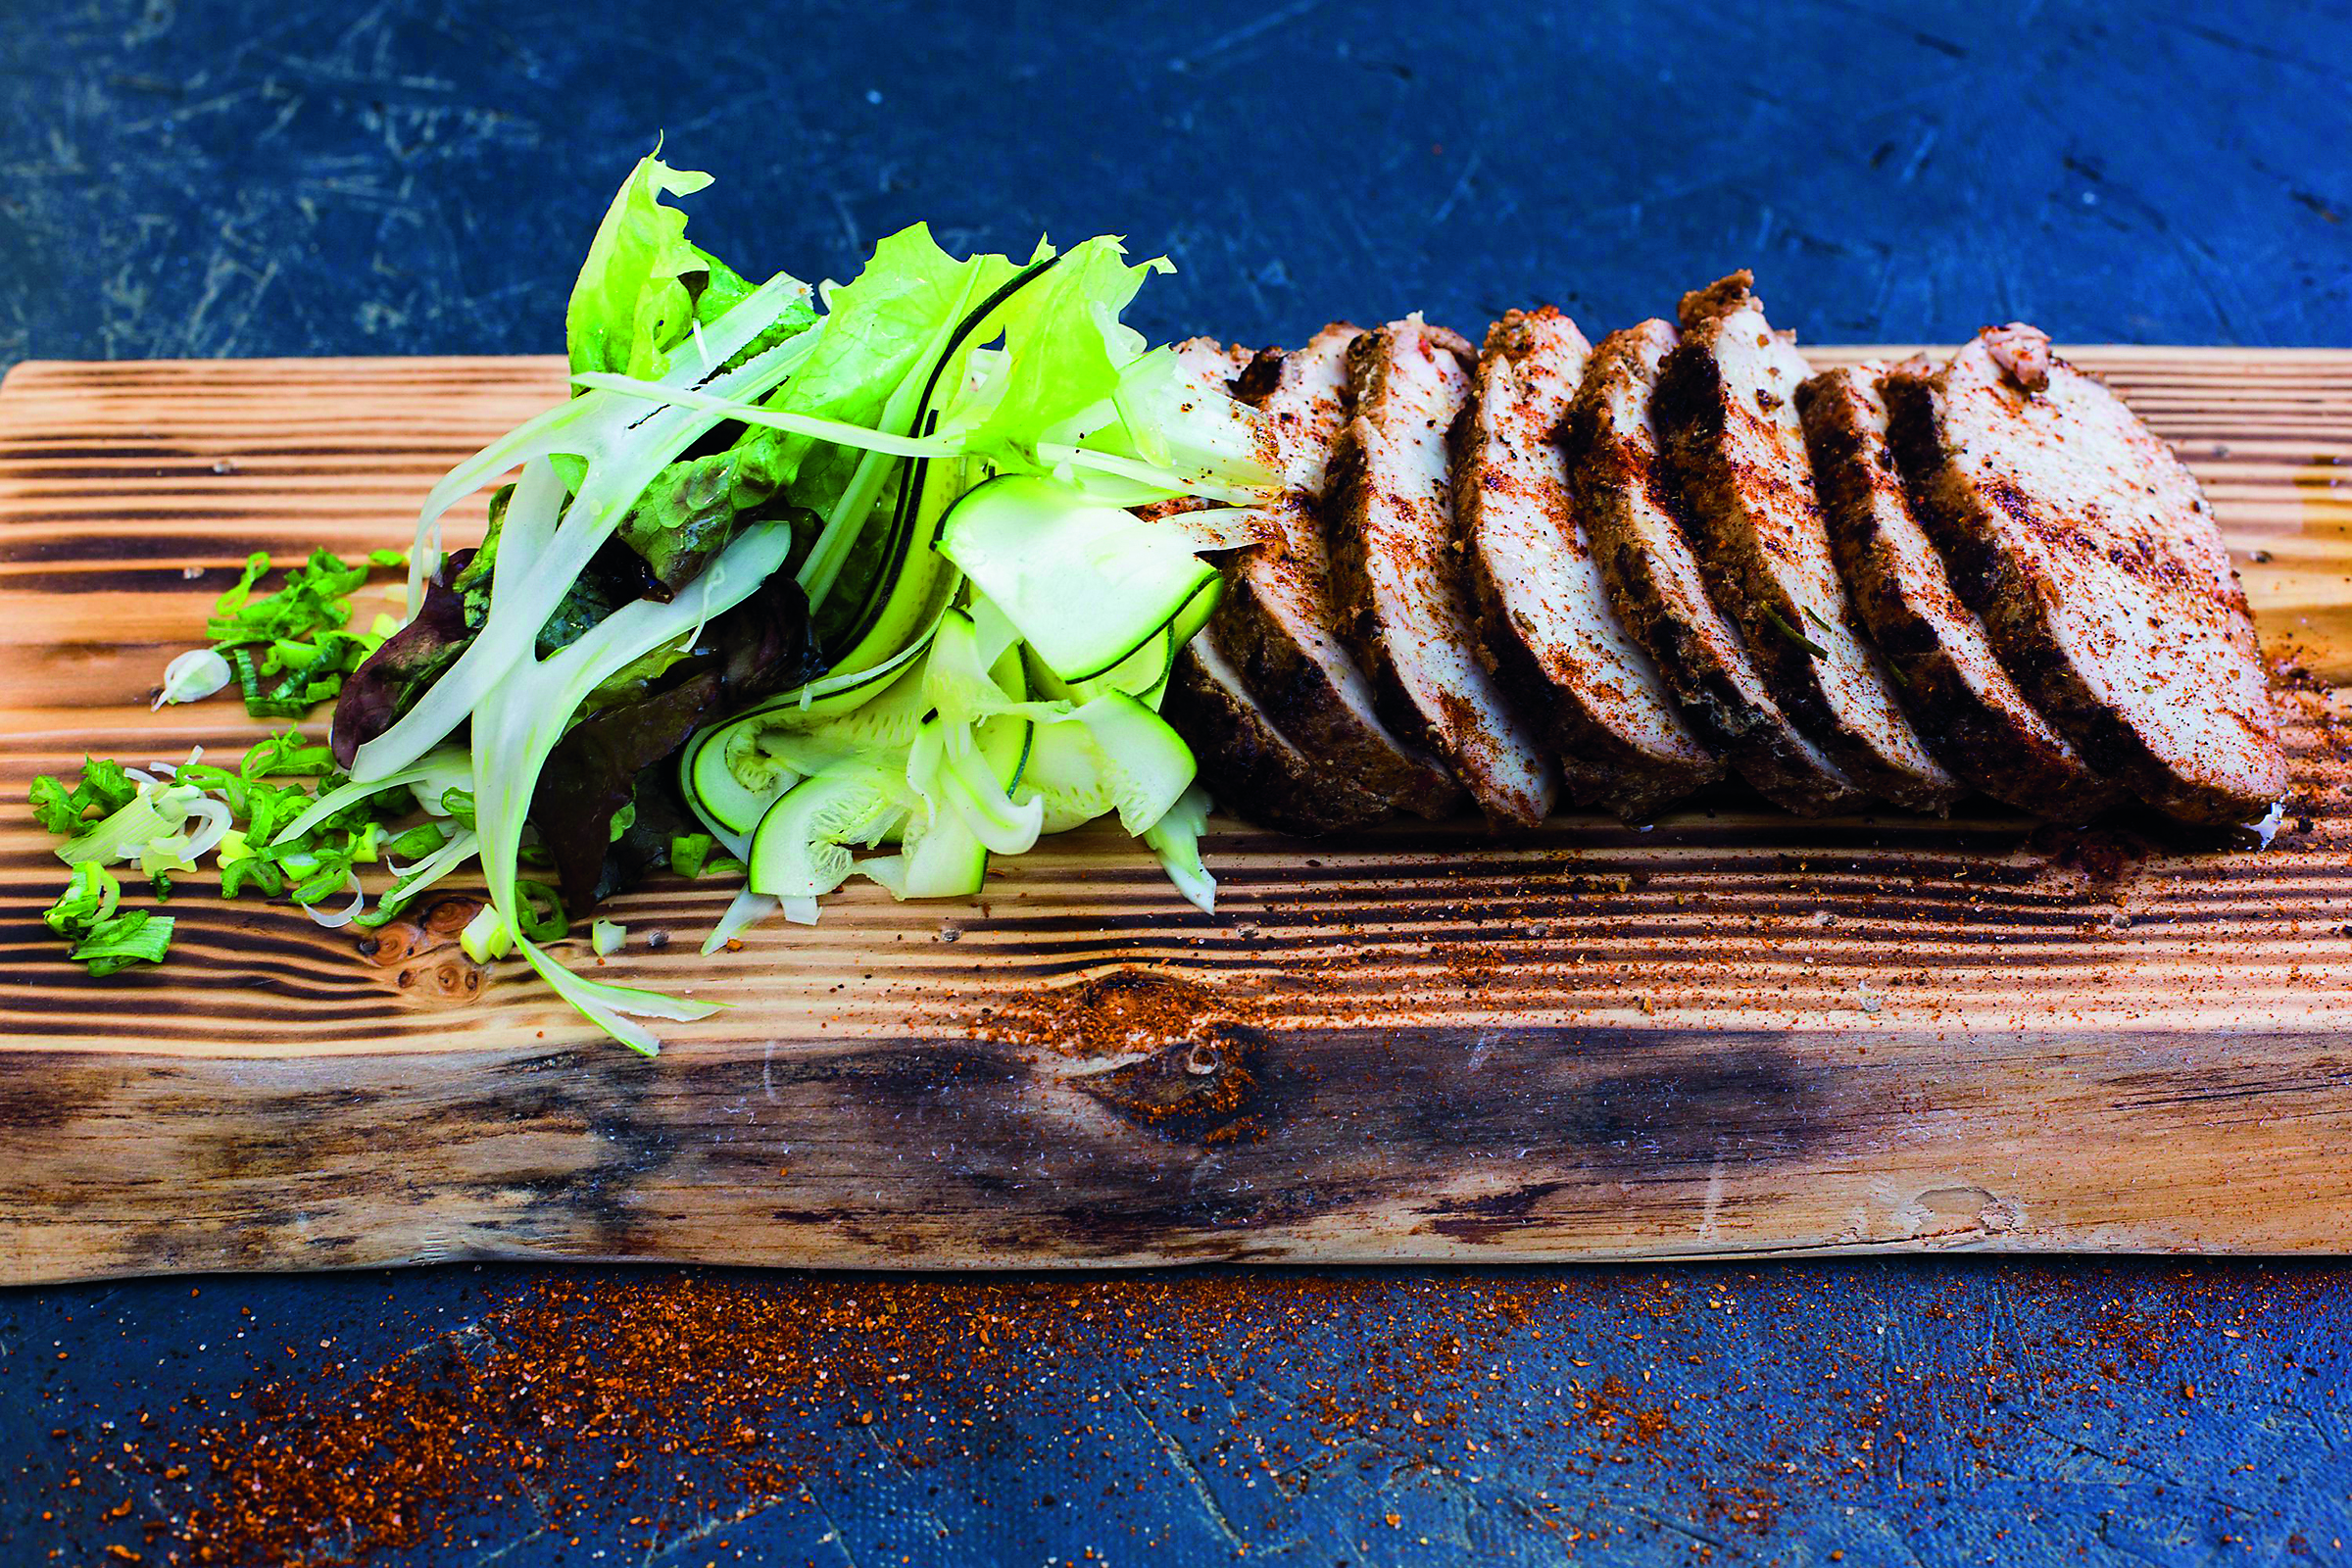 Zagreb, 221116. Tvrtko Sakota iz Rougemarina pripremio je pecenke za svecani blagdanski stol. Ta mesa marinirana i pripremljena za pecenje mogu se izmedju ostale mesne ponude kupiti u njihovoj mesnici Sandoku u neposrednoj blizini restorana. Foto: Berislava Picek/ CROPIX